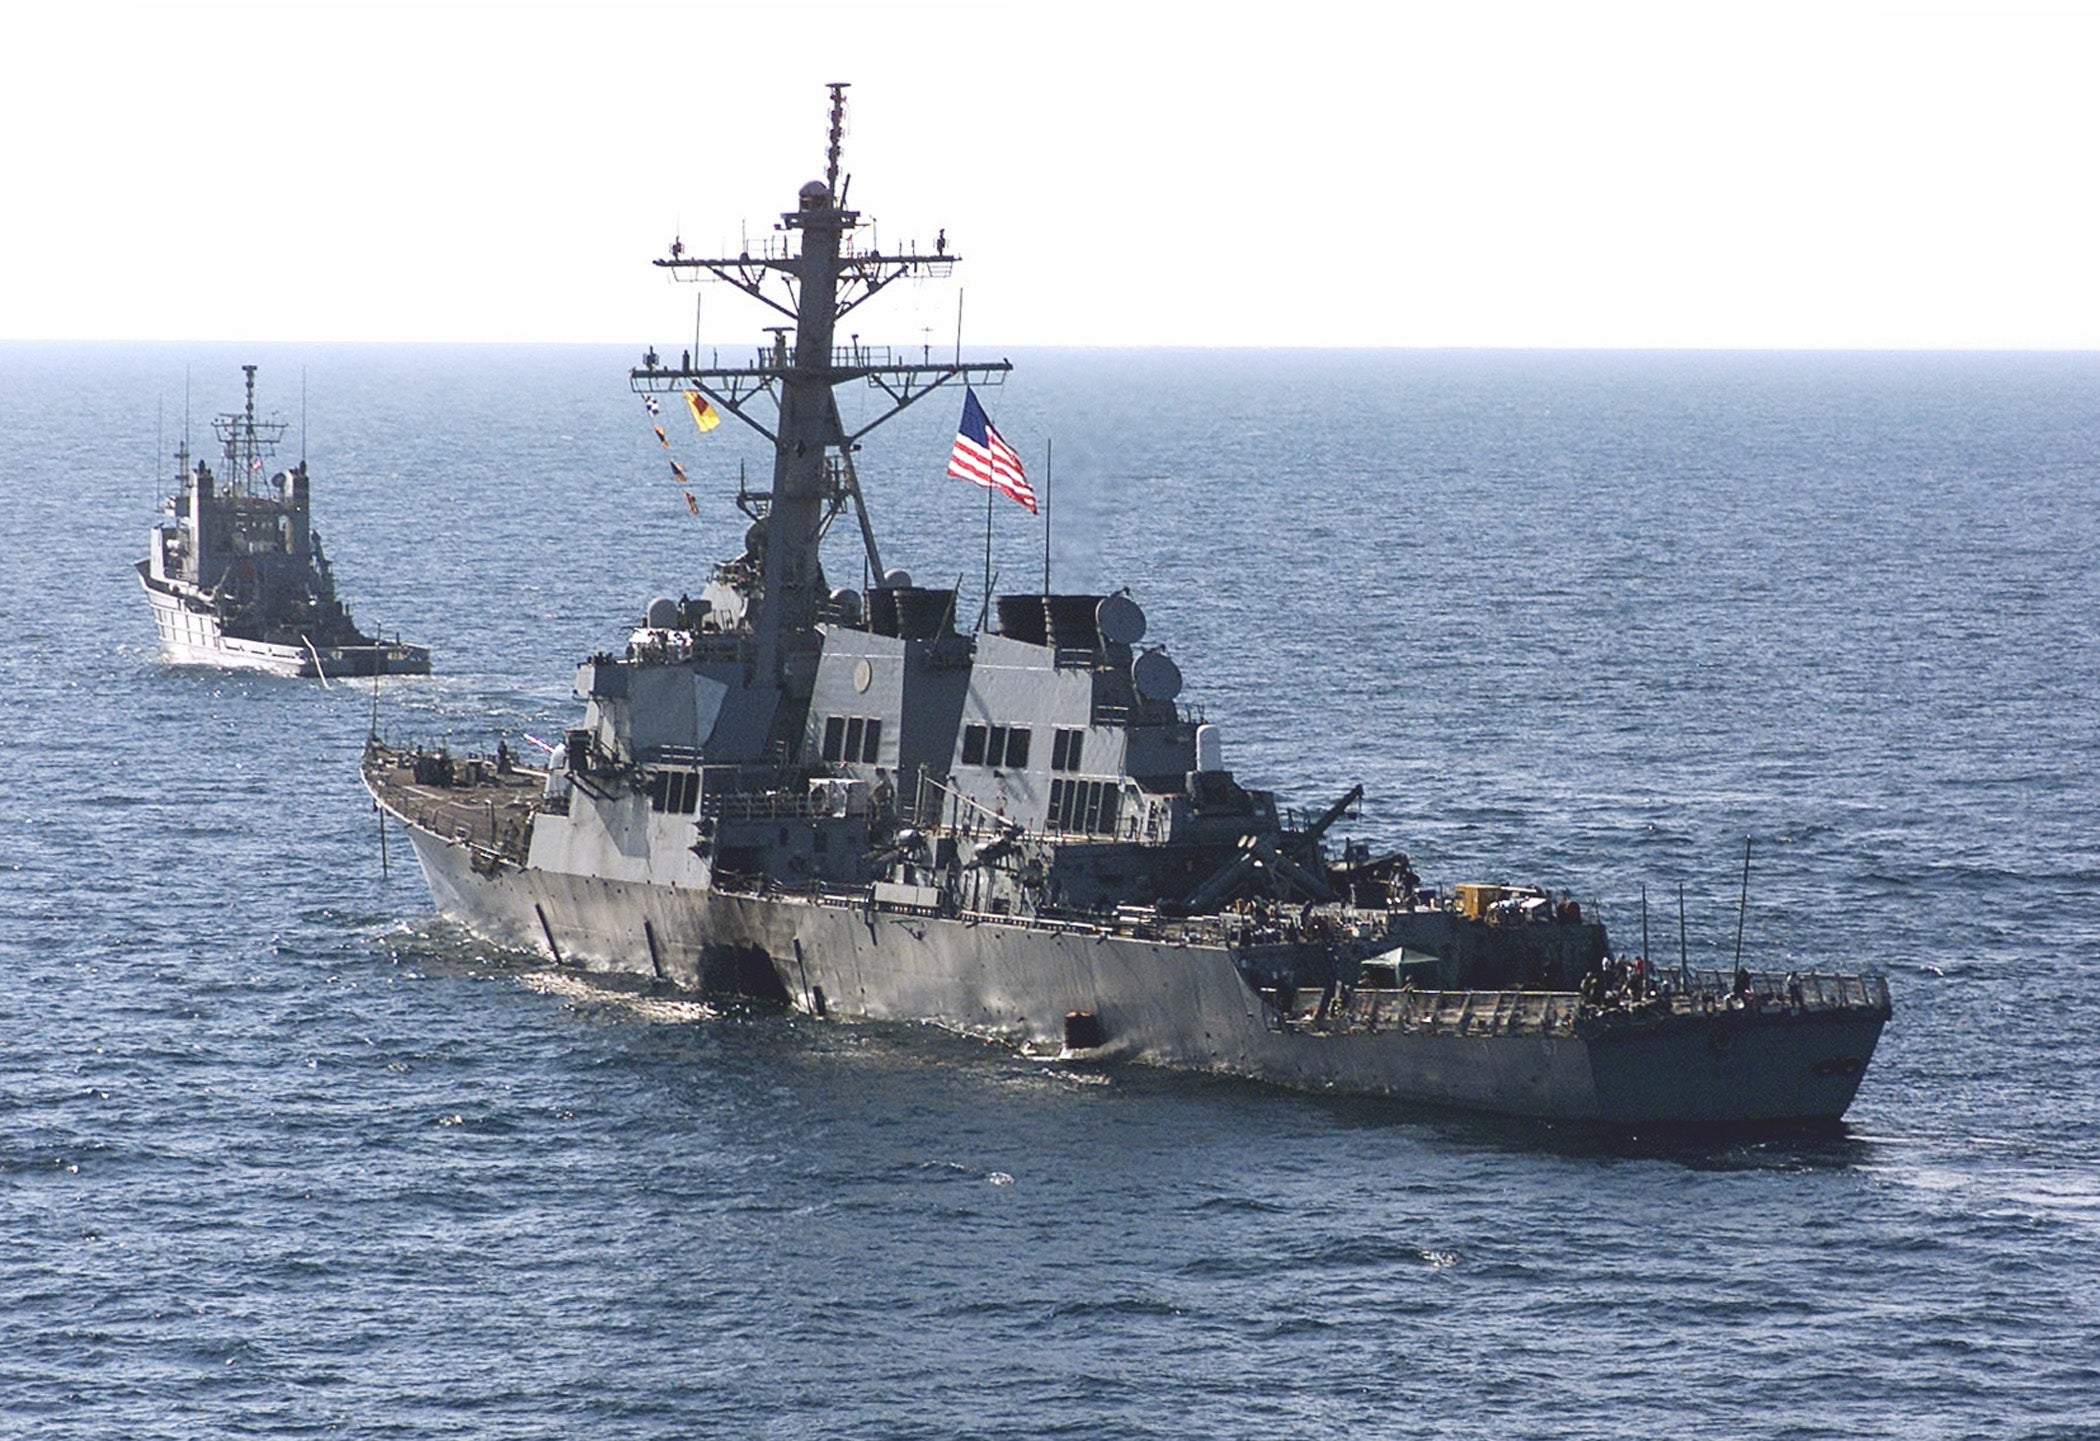 USS Cole bombing testimony